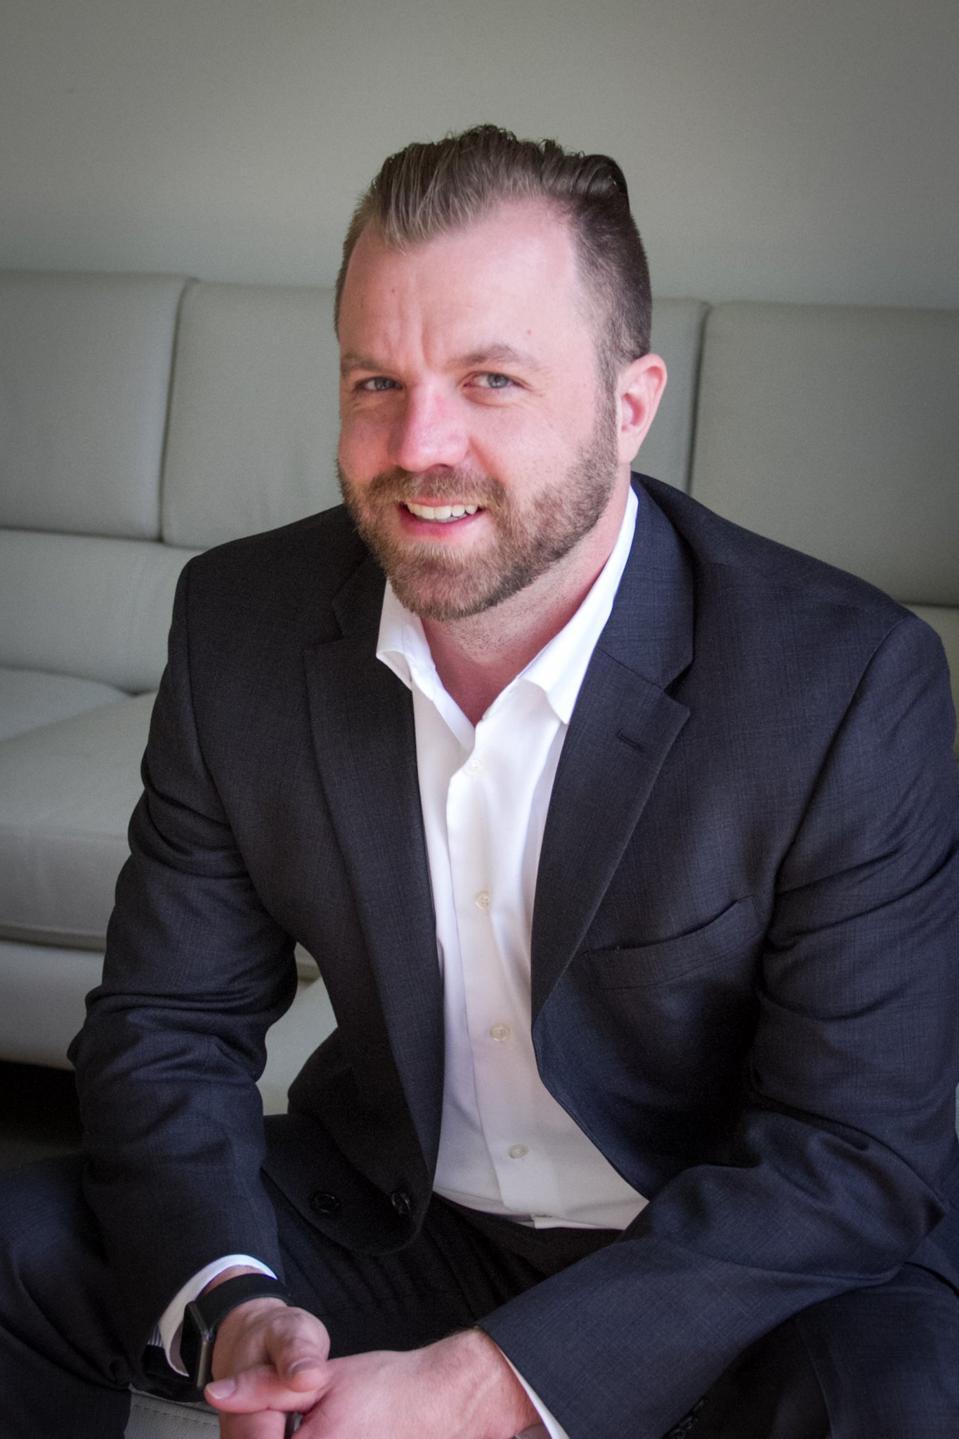 Jeremy O'Keefe, CEO and founder of Yobi // Credit: Yobi